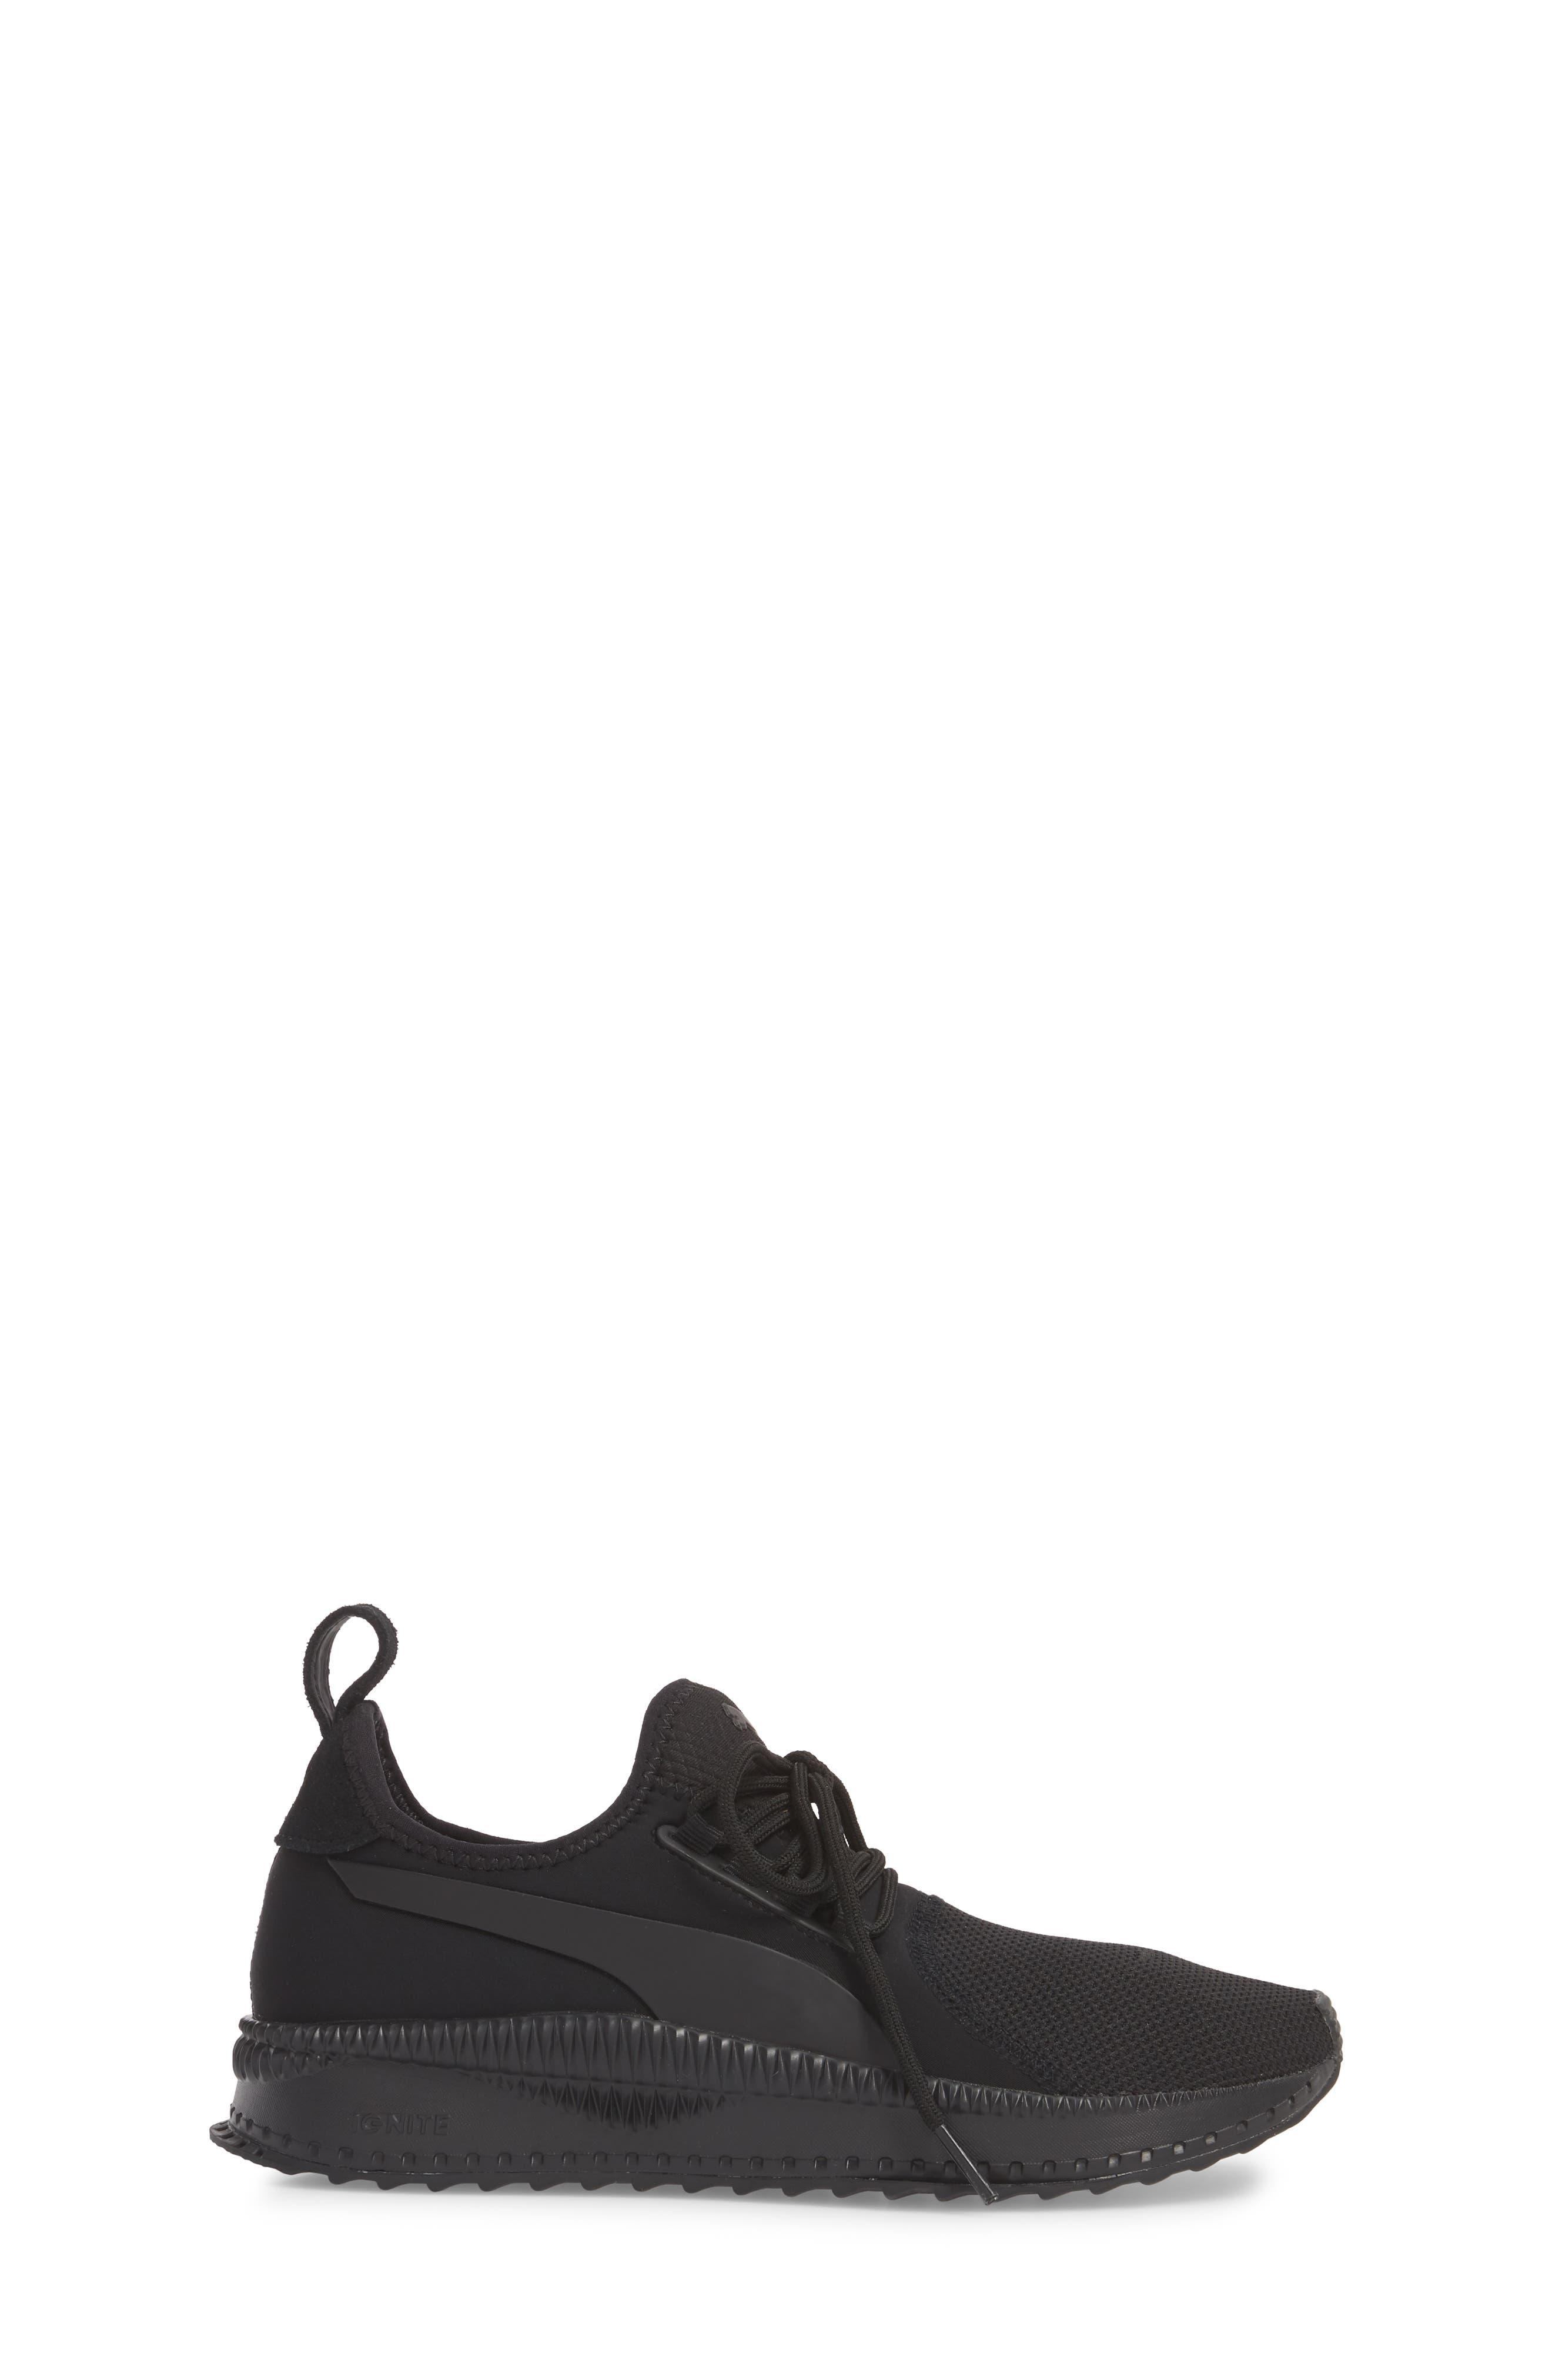 Tsugi Apex Sneaker,                             Alternate thumbnail 3, color,                             001